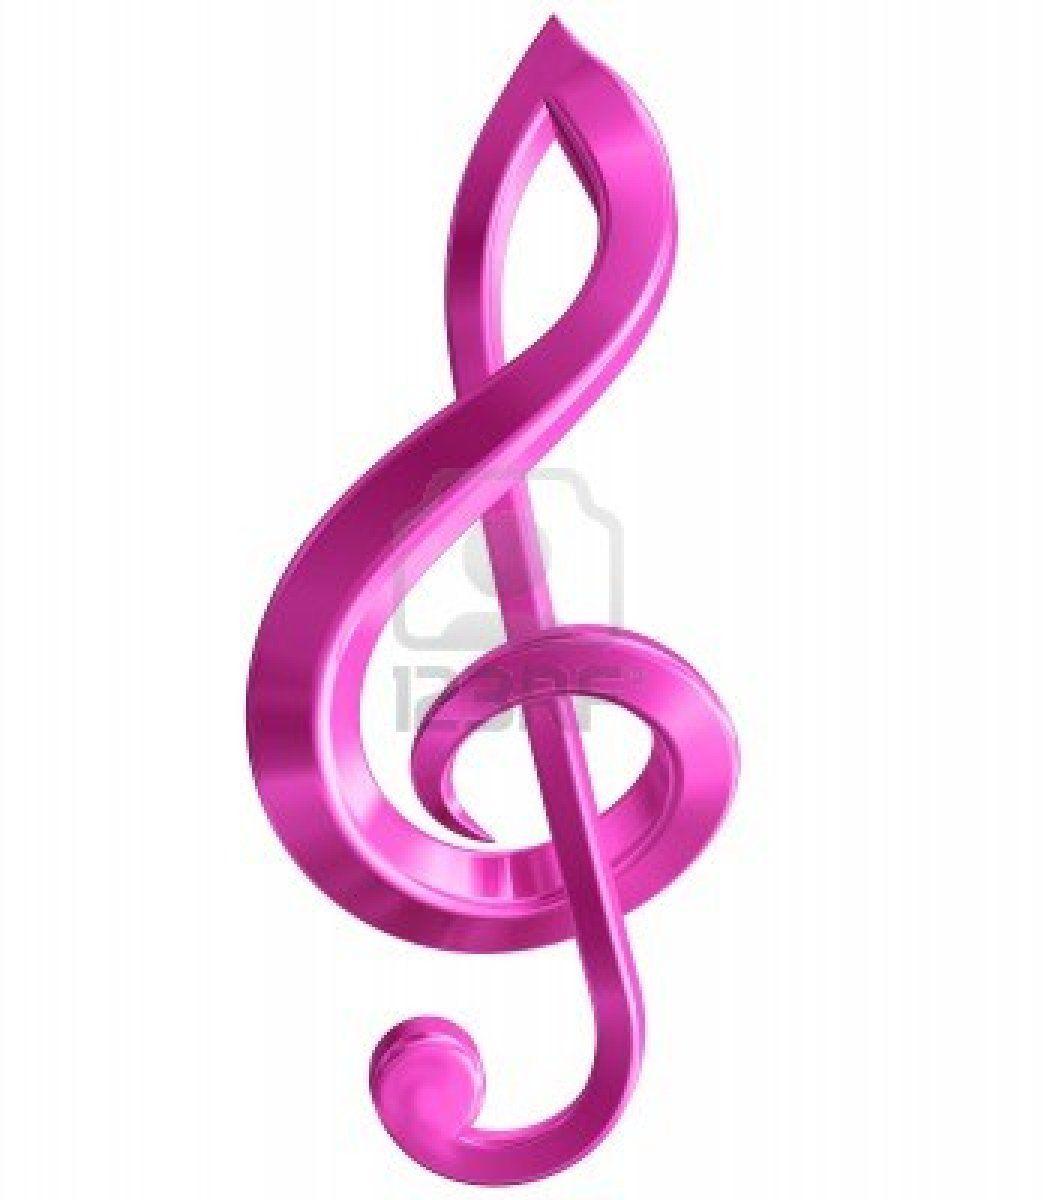 Colorful music notes symbols httpsigilaffirmations colorful music notes symbols httpsigilaffirmations buycottarizona Image collections